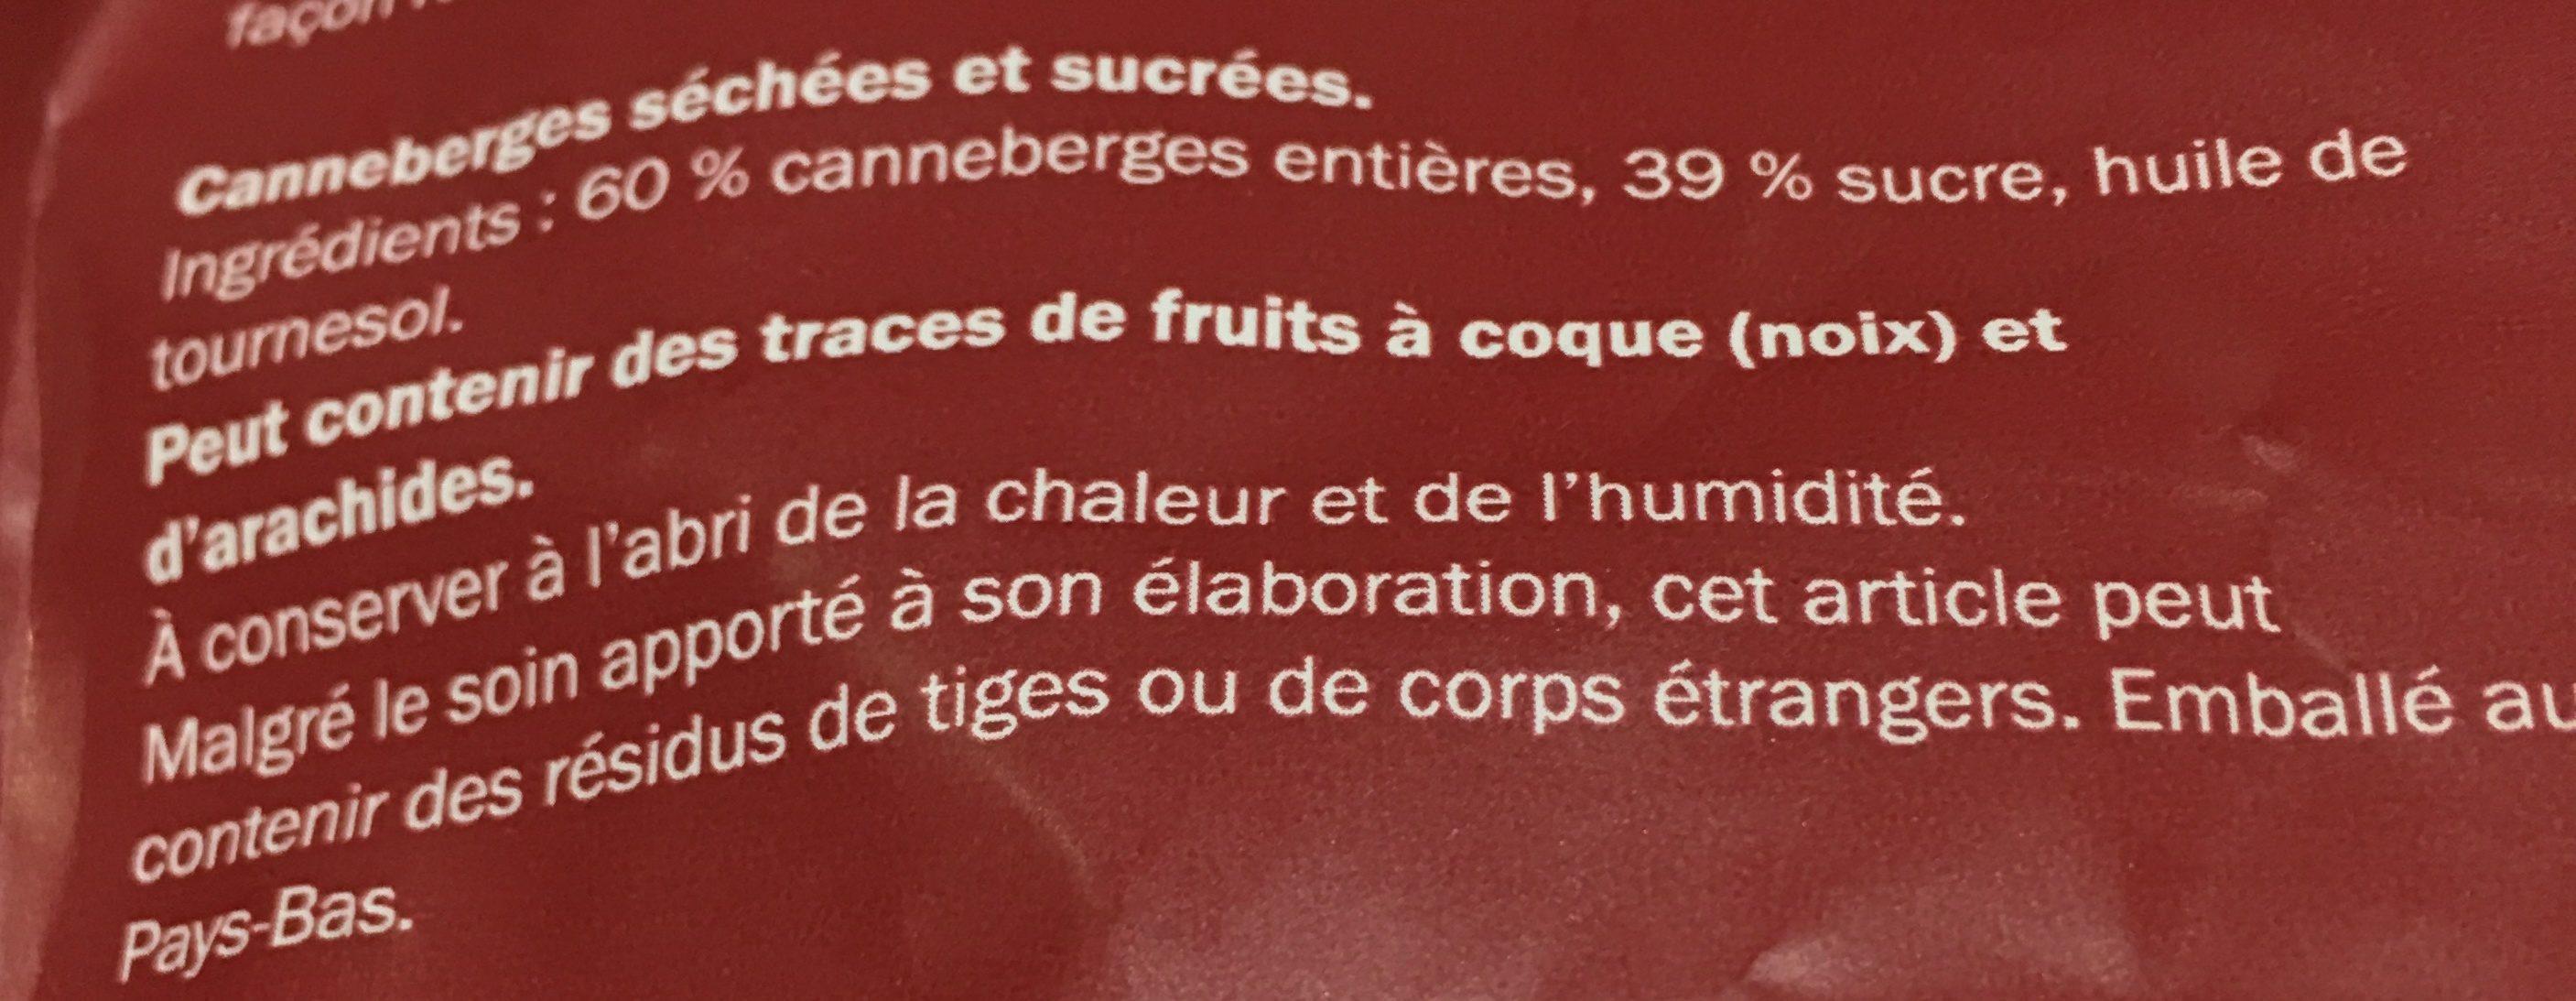 Canneberges (séchées/sucrées) - Inhaltsstoffe - fr